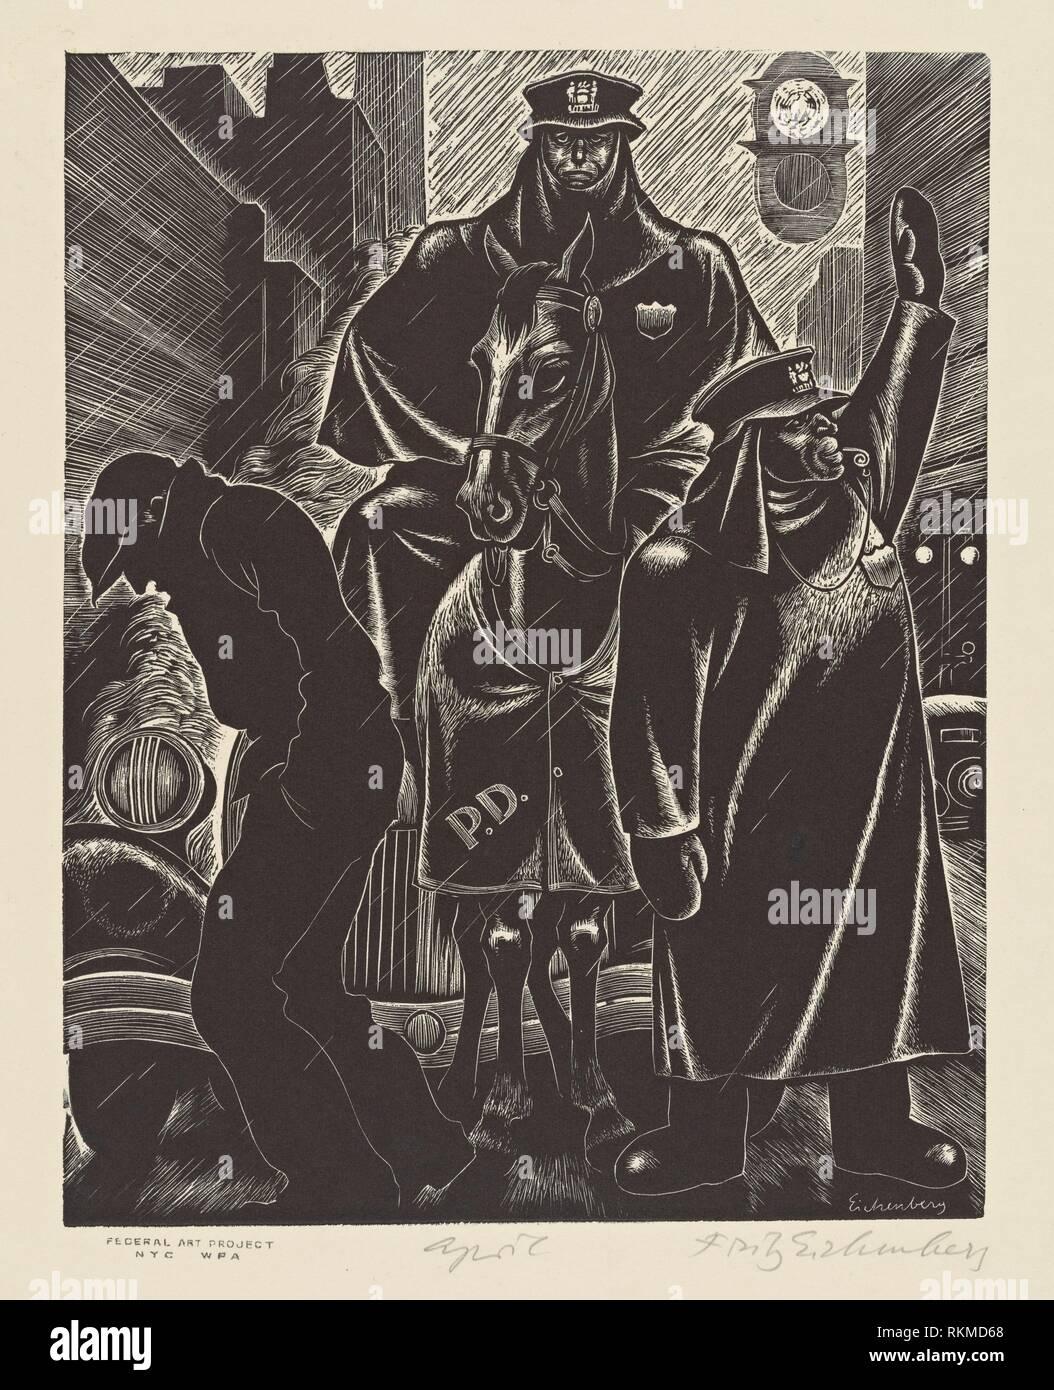 De abril. Estados Unidos. Administración de obras en progreso (patrocinador), Fritz Eichenberg, 1901-1990 (artista). Administración de Obras en Progreso (WPA) Art. Fecha Foto de stock